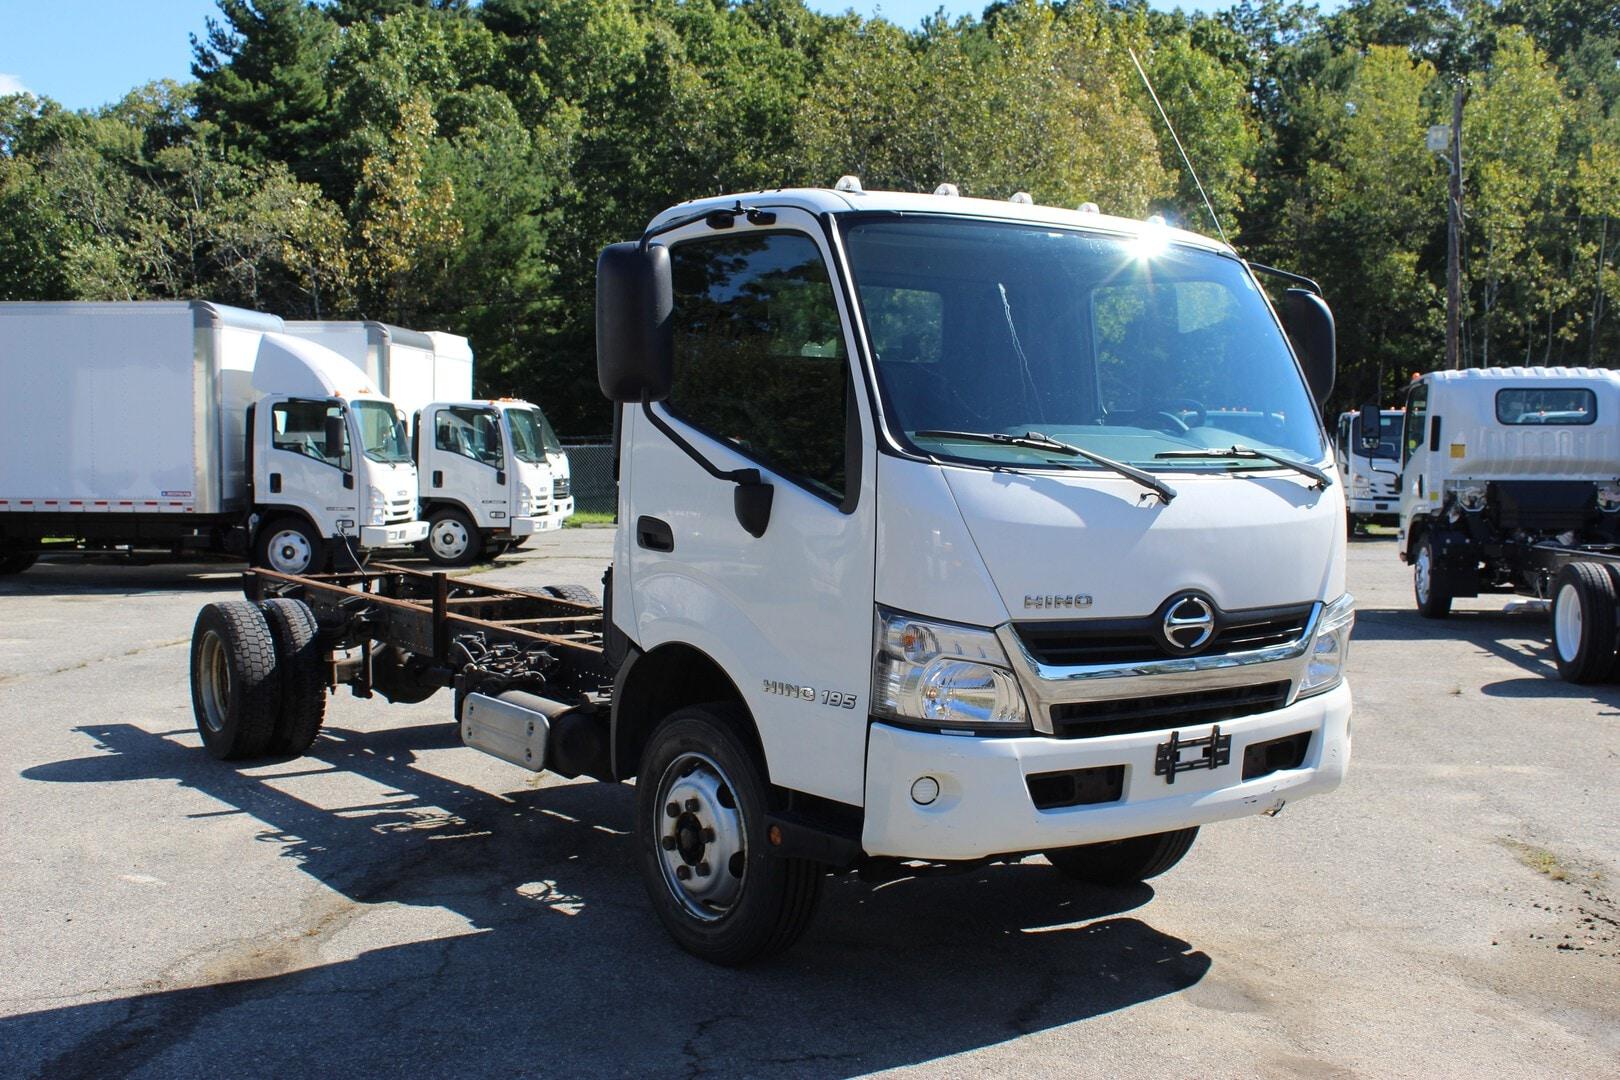 Used, 2017, Hino, 195, Cab / Chassis Trucks